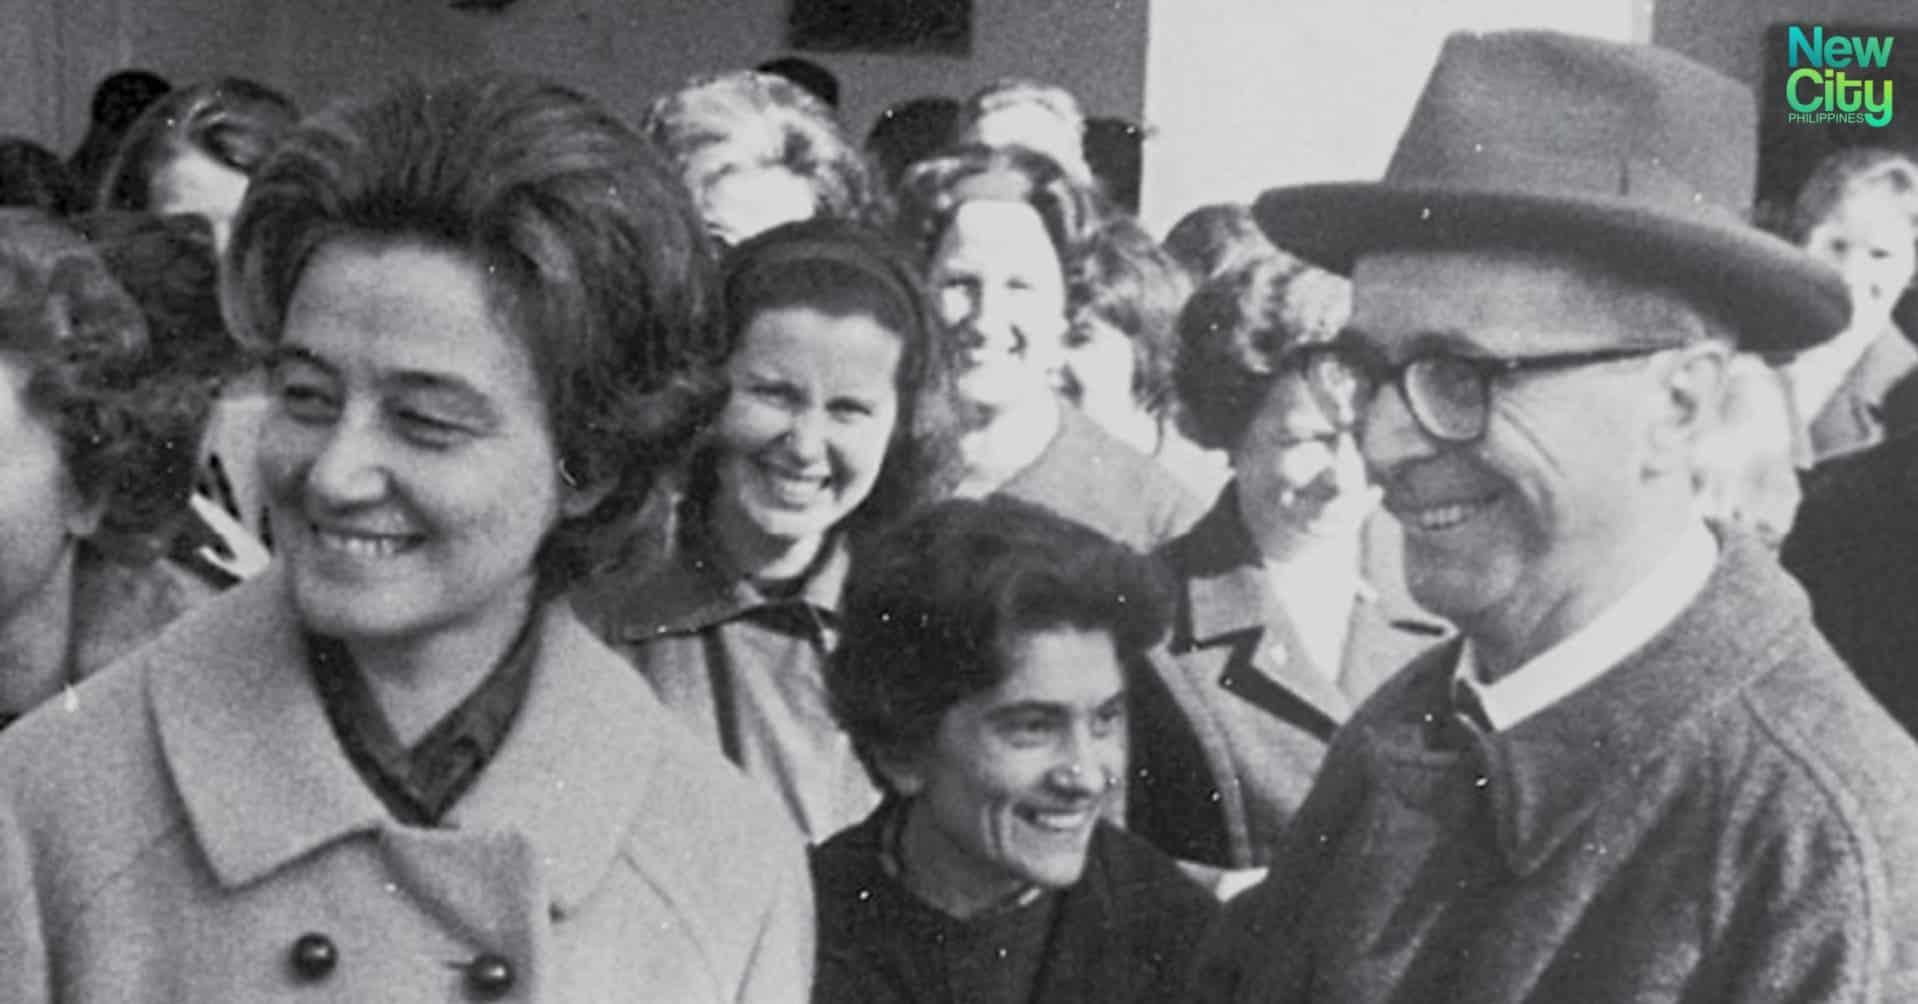 Chiara and Igino Giordani in the 1960s.